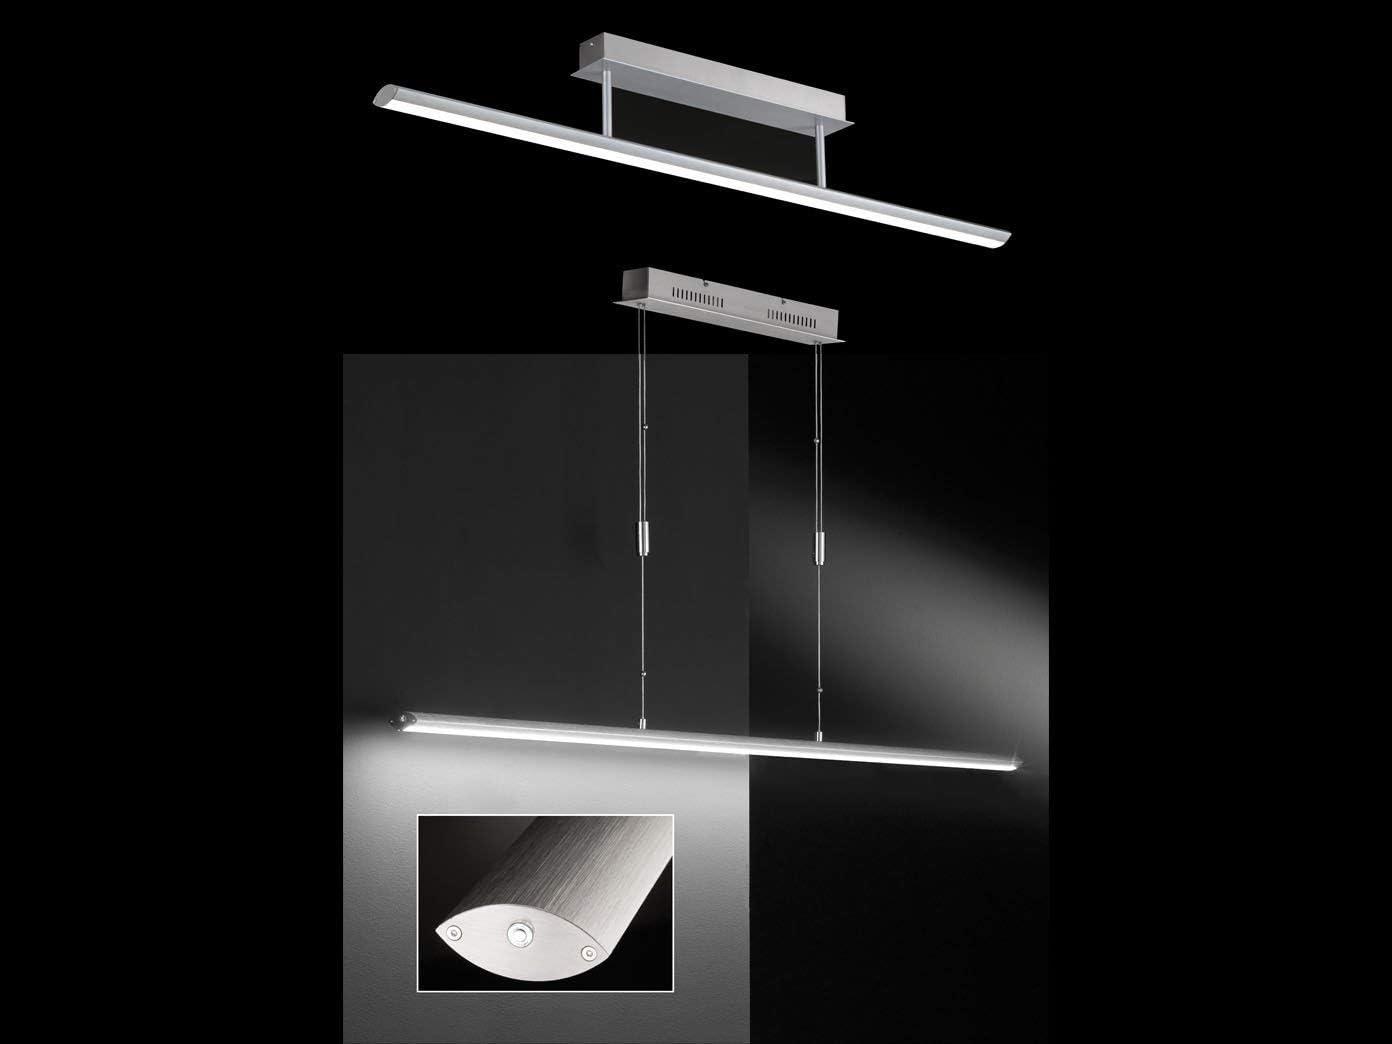 Aluminium//Mattnickel Fischer /& Honsel Beat Pendelleuchte